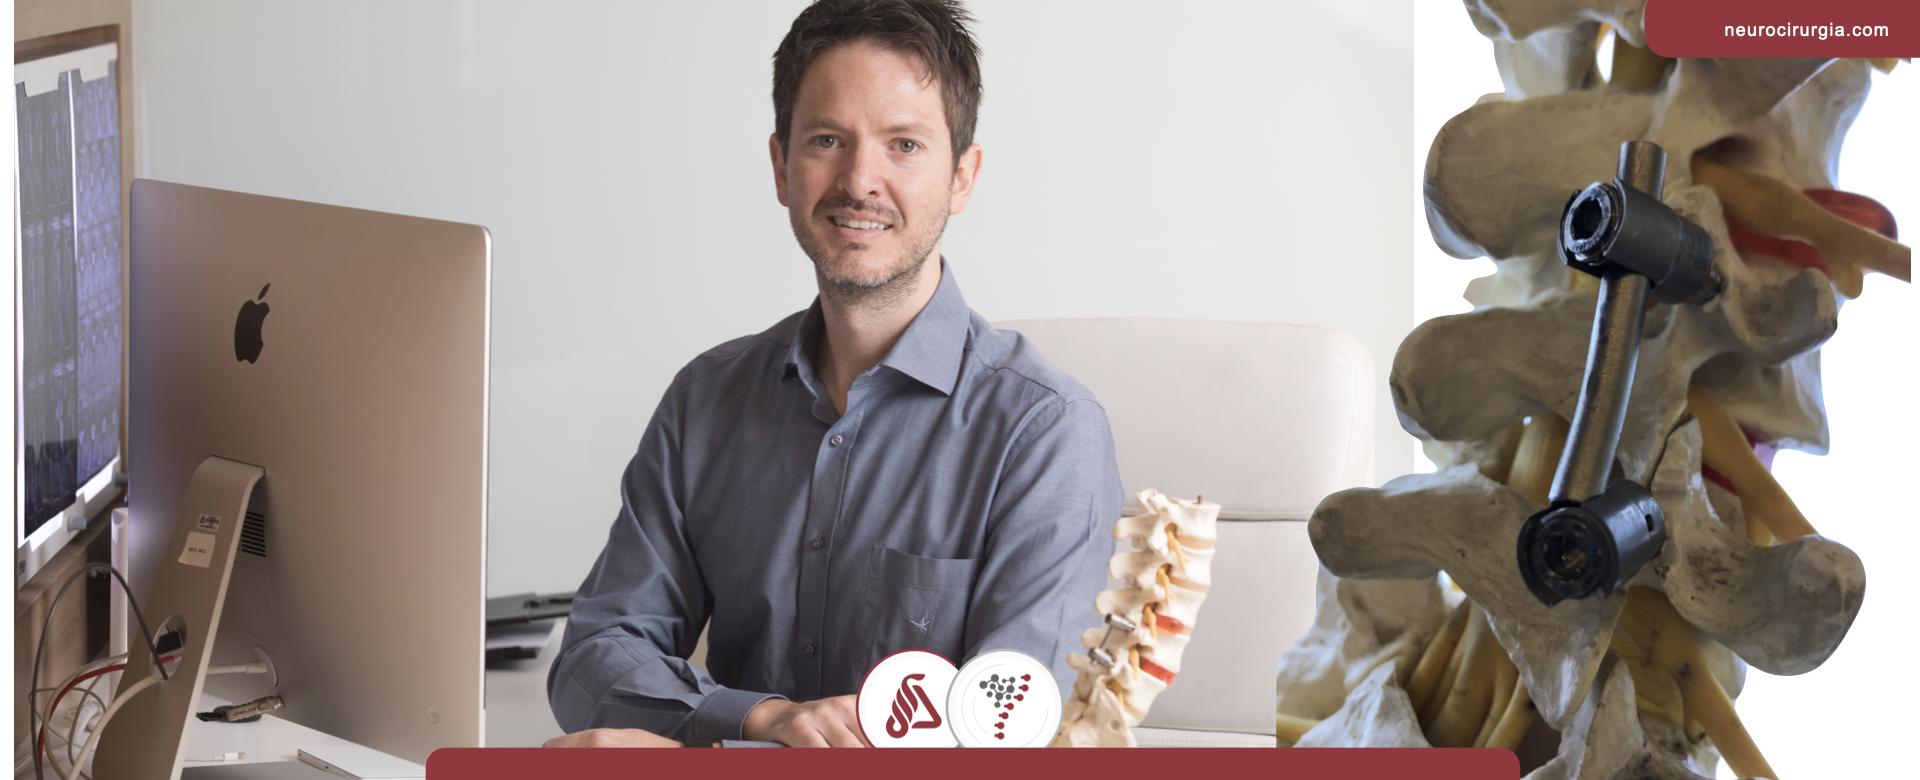 Artrodese e endoscopia da coluna